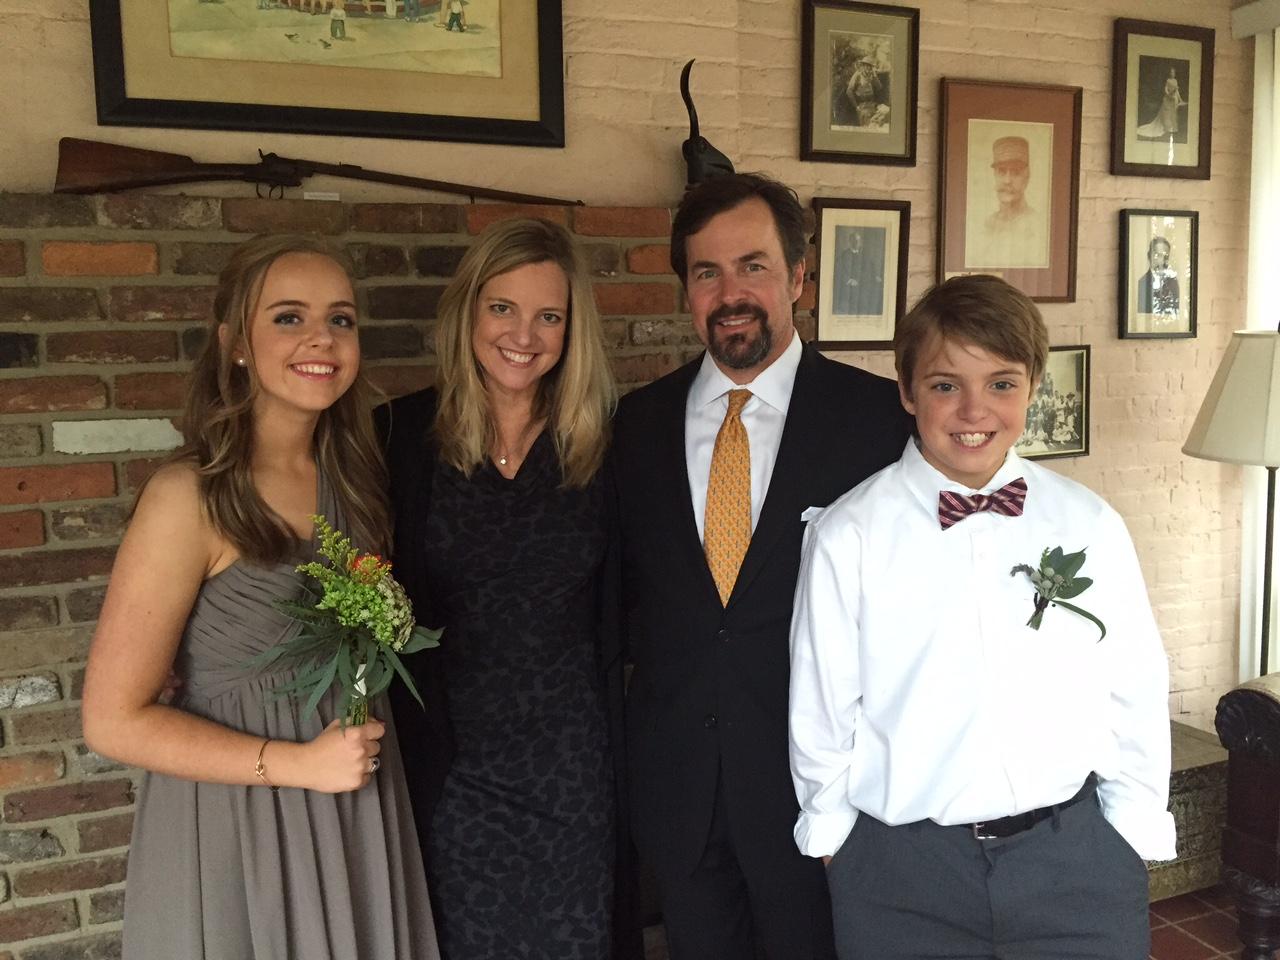 alh-family-photo